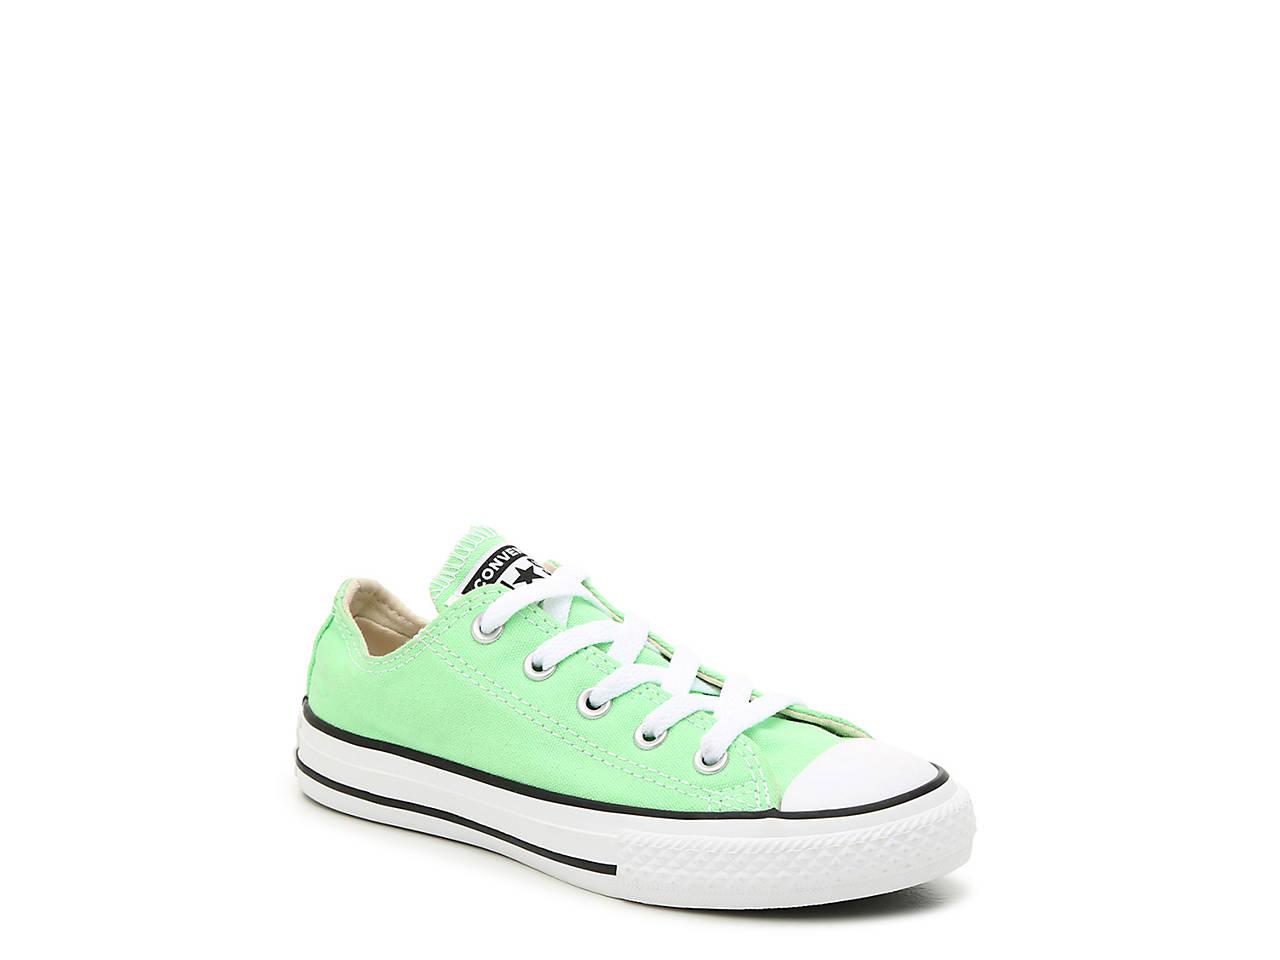 8b37d9145c98 Converse Chuck Taylor All Star Seasonal Toddler   Youth Sneaker Kids ...